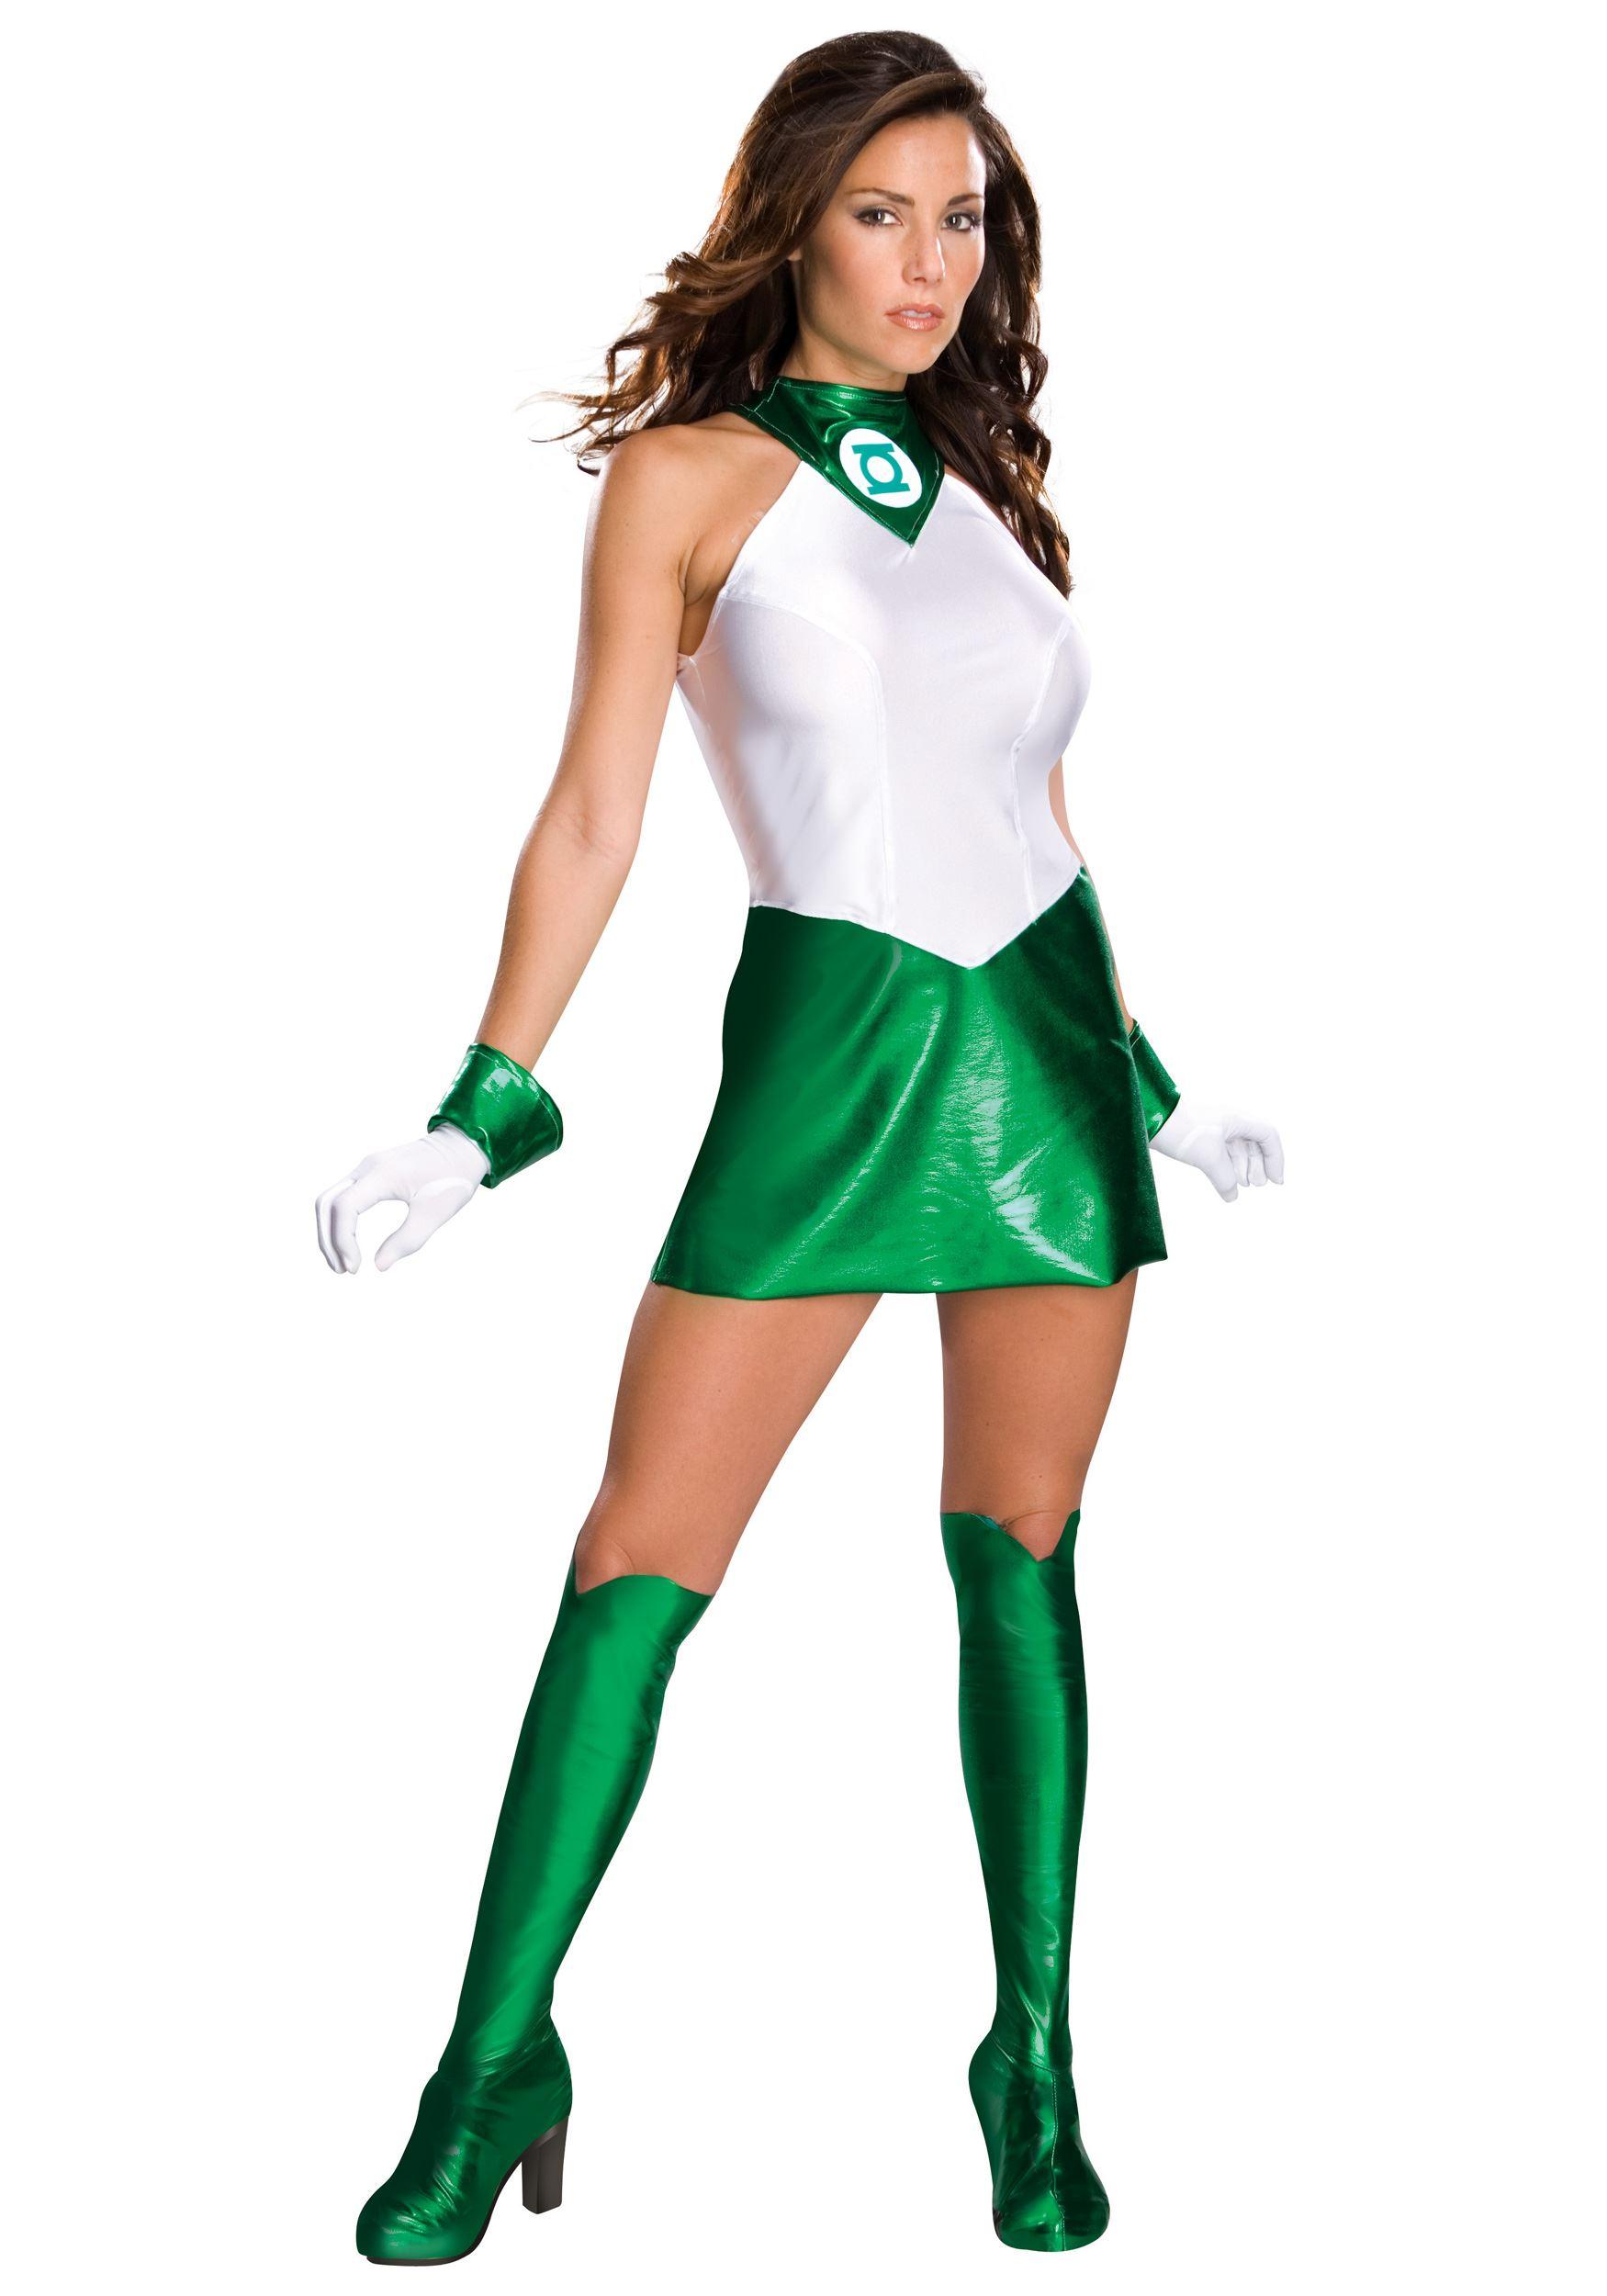 Adult Green Lantern Woman Costume  sc 1 st  The Costume Land & Adult Green Lantern Woman Costume | $55.99 | The Costume Land